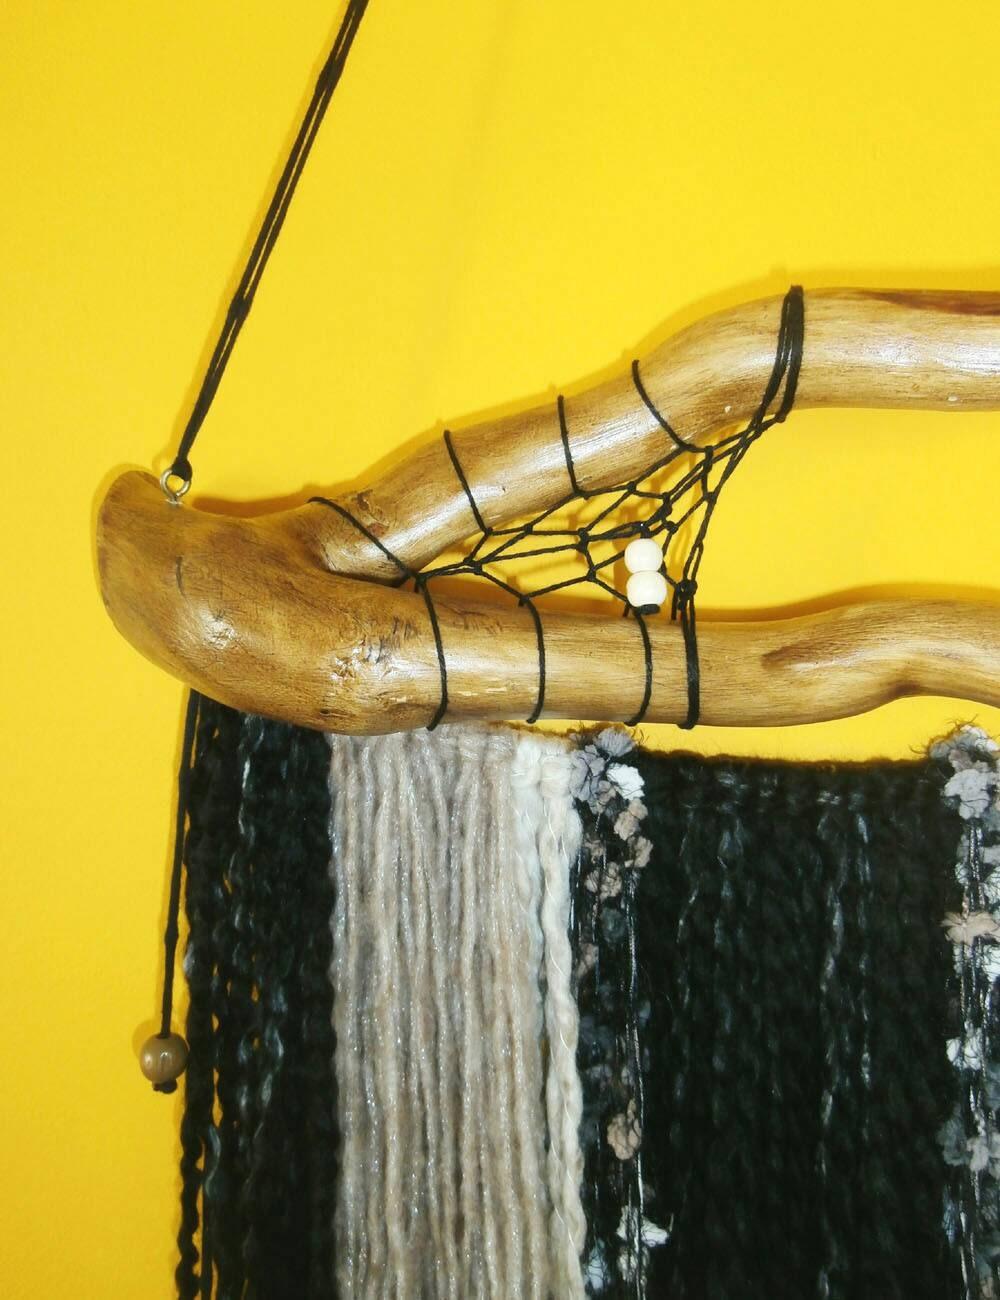 Amazing Yarn Wall Decor Vignette - Art & Wall Decor - hecatalog.info